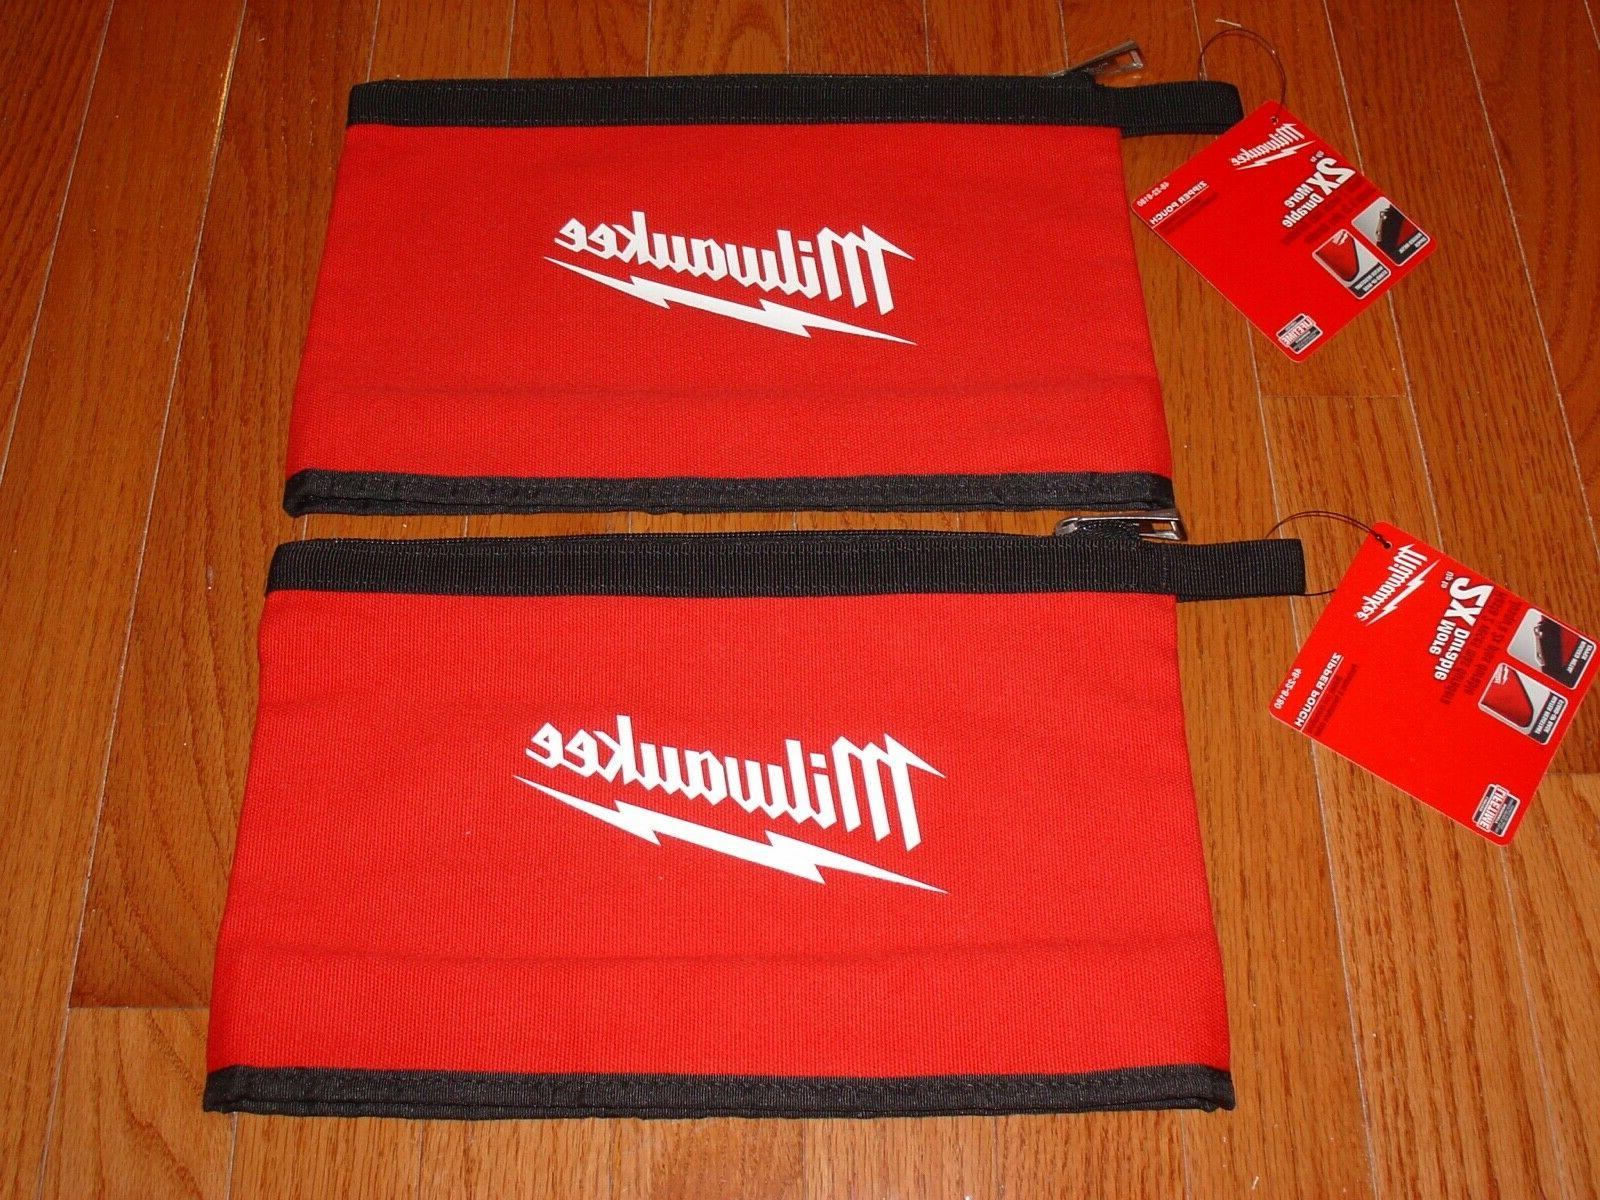 red zipper pouch bag heavy